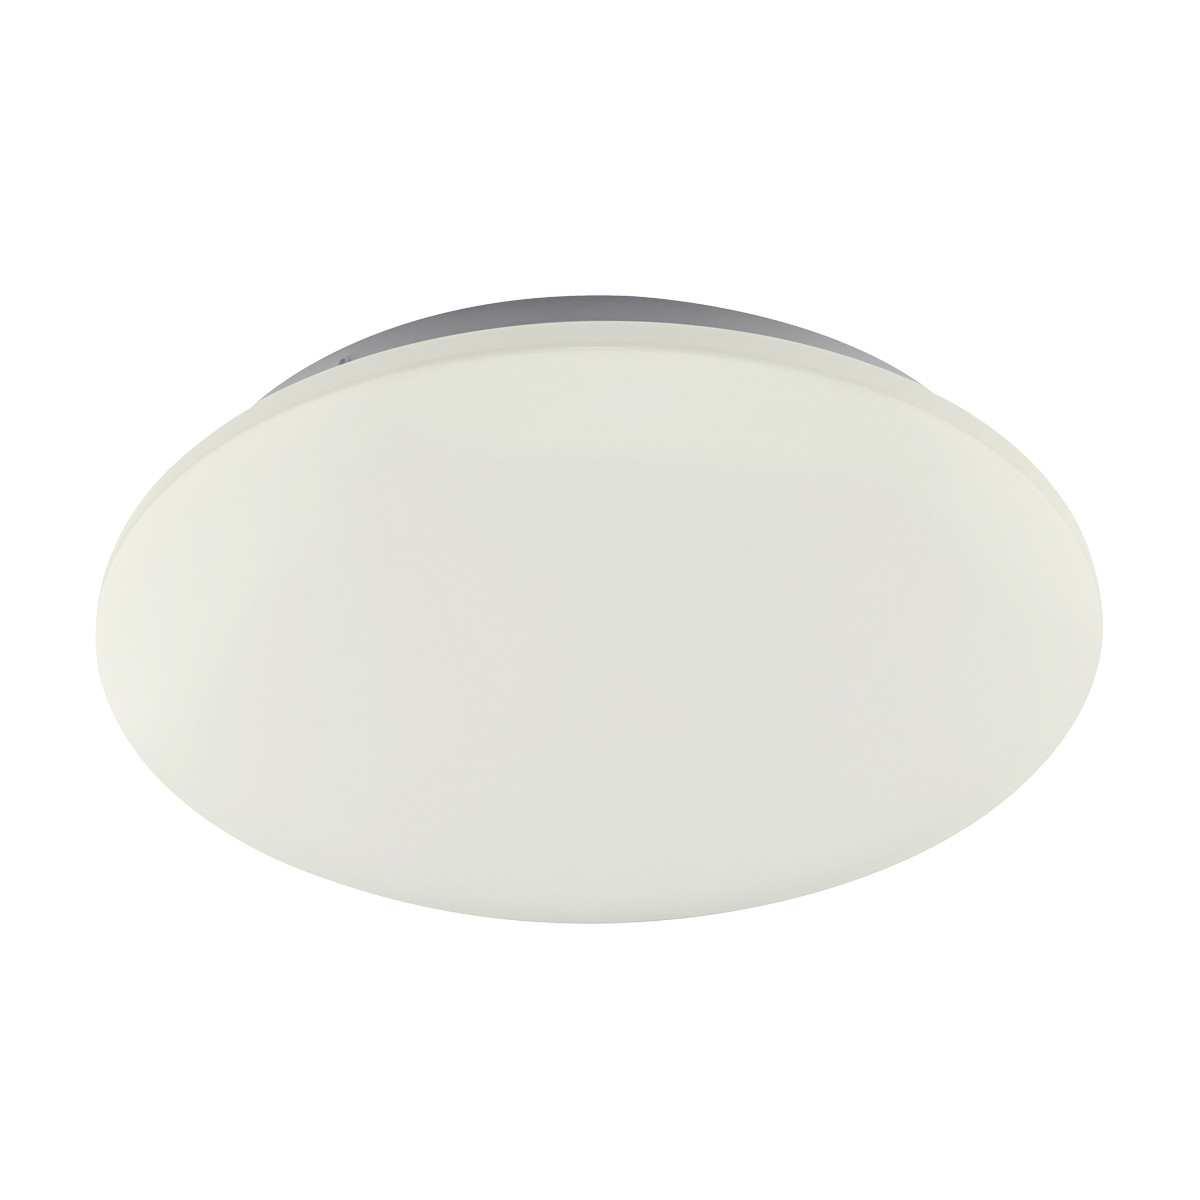 Zero II Flush 48cm Round 50W LED 3000K, 3700lm, White